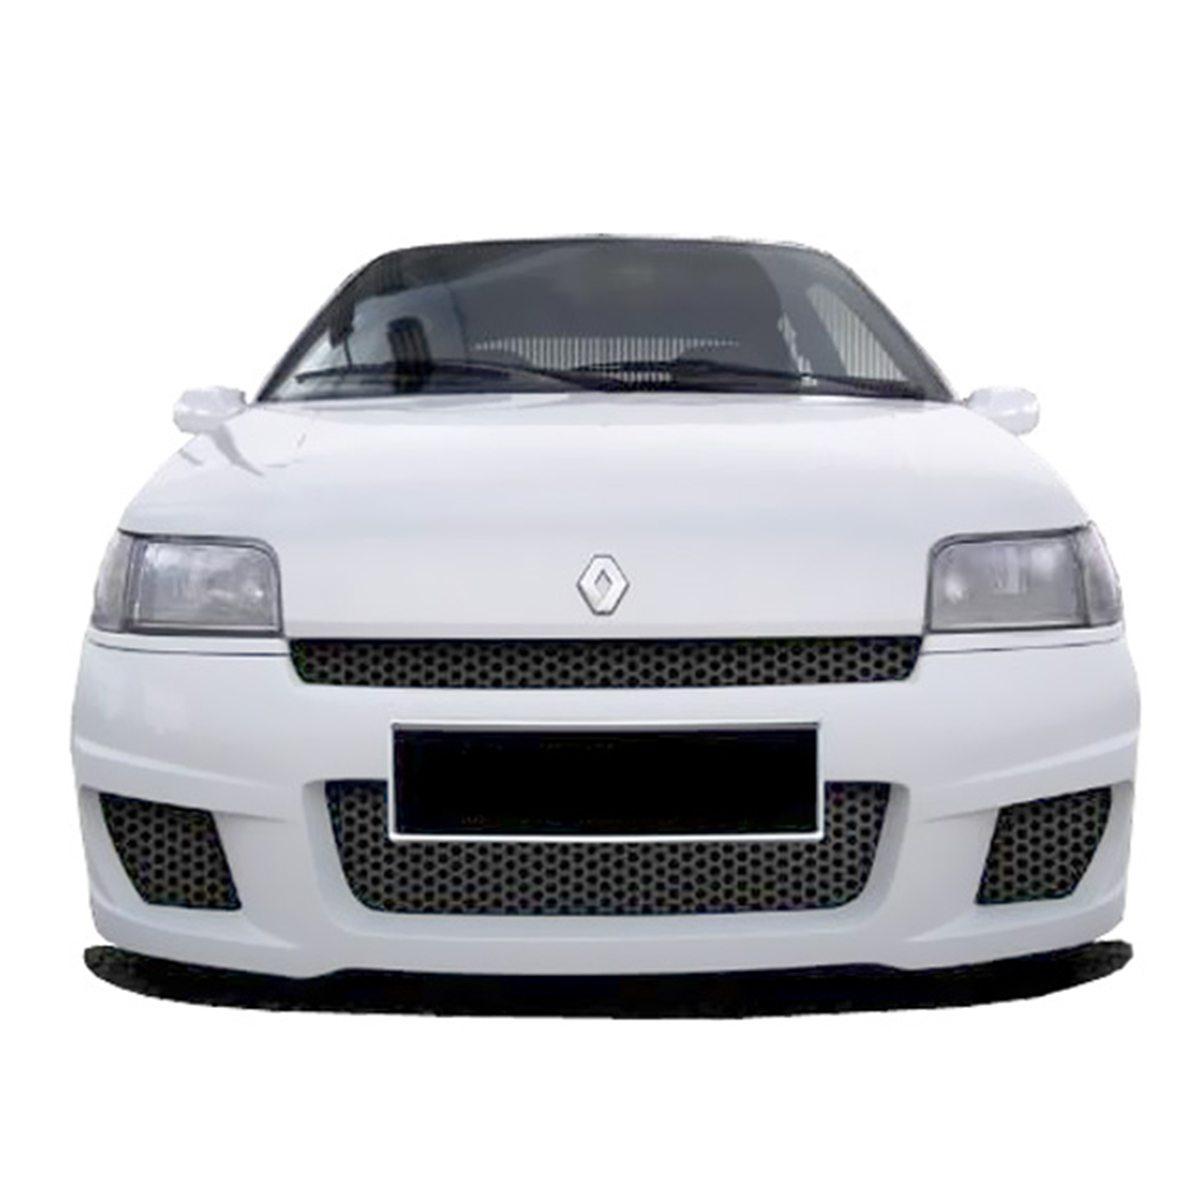 Renault-Clio-92-Mav-Frt-PCS170